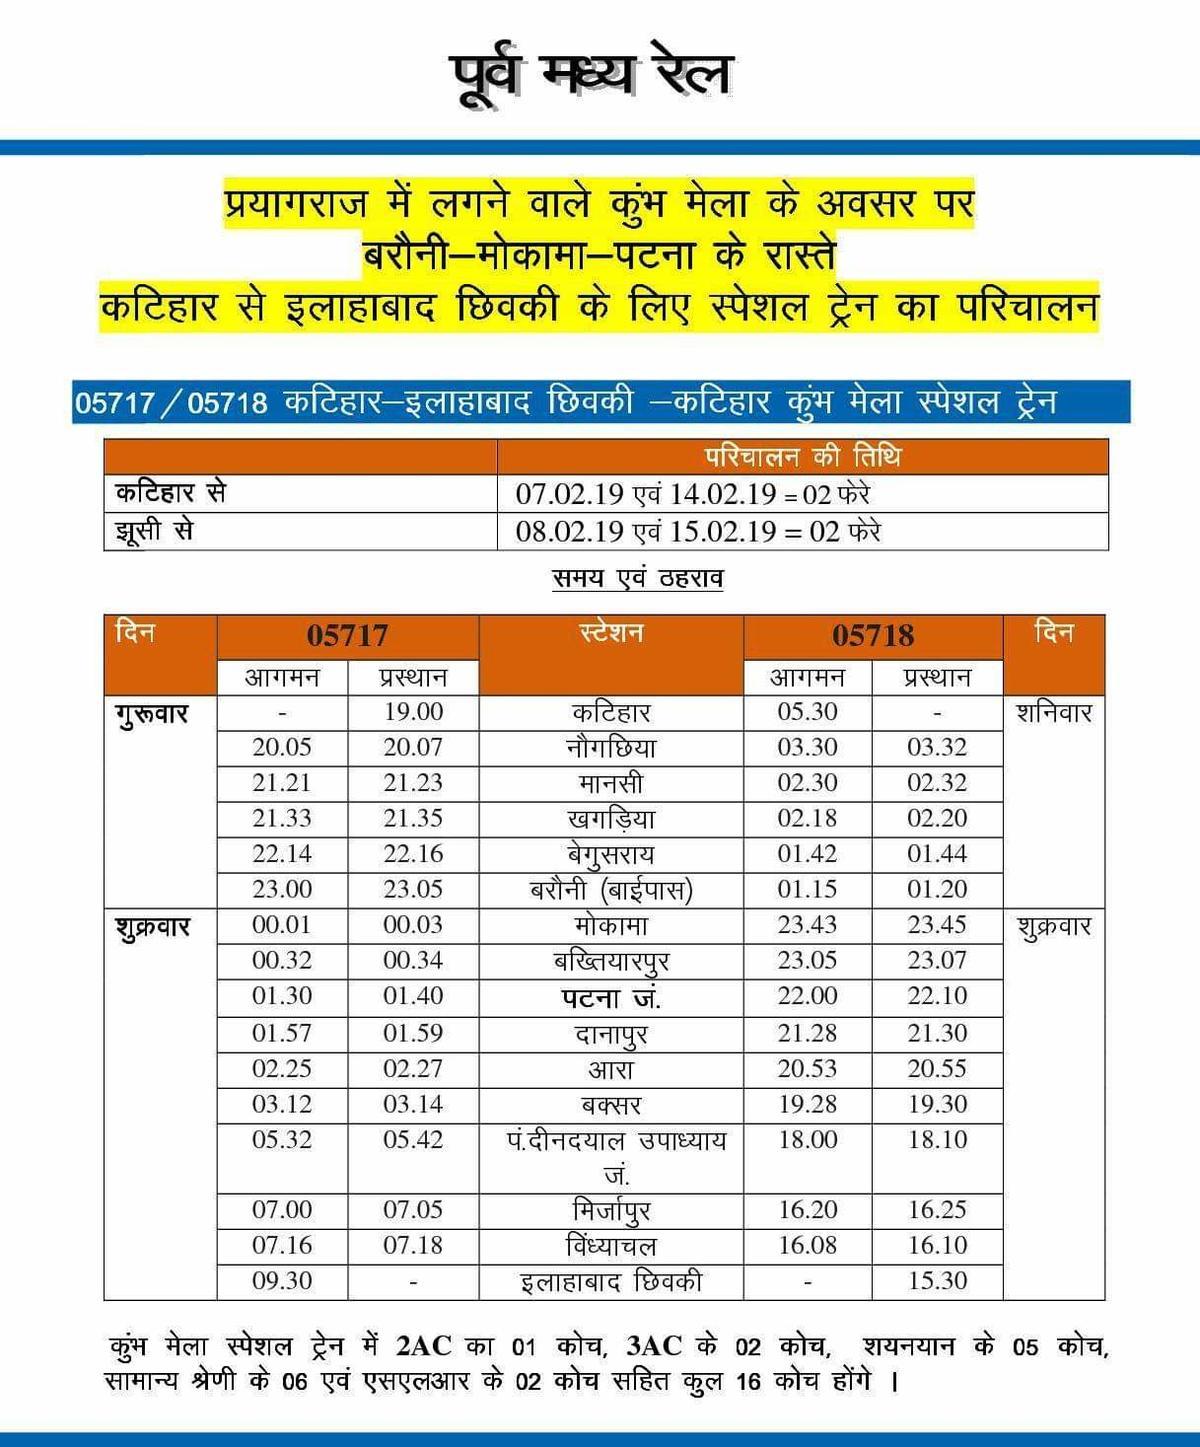 Allahabad Chheoki Railway Station Picture & Video Gallery - Railway